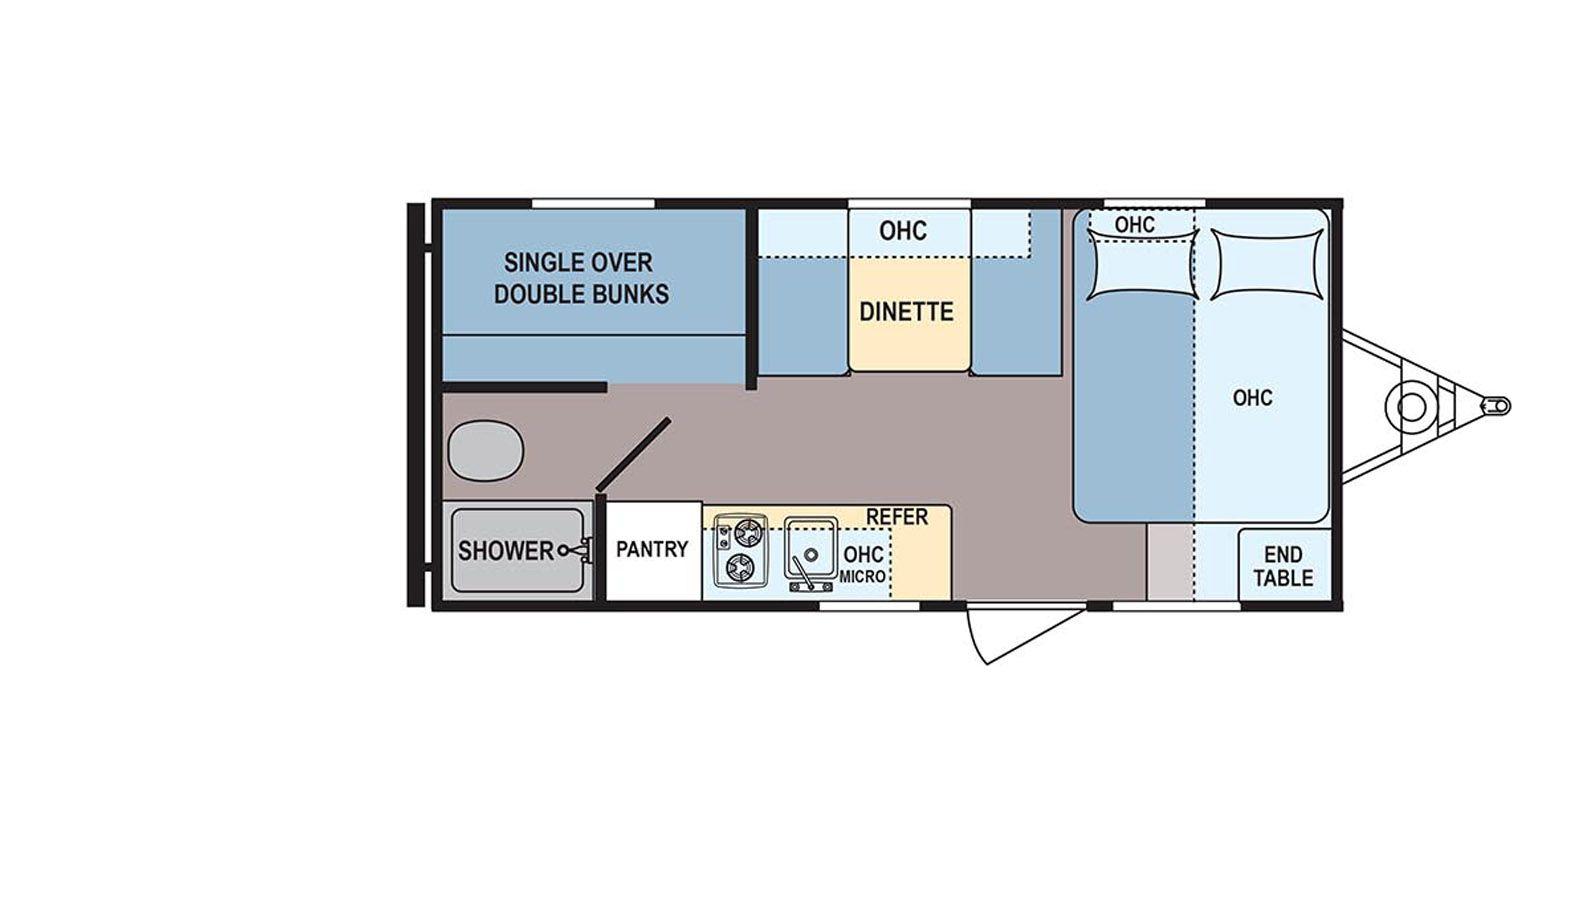 Coleman 17fq Lantern Lt Conventional Floorplan Details Travel Trailer Floor Plans Travel Trailer Floor Plans